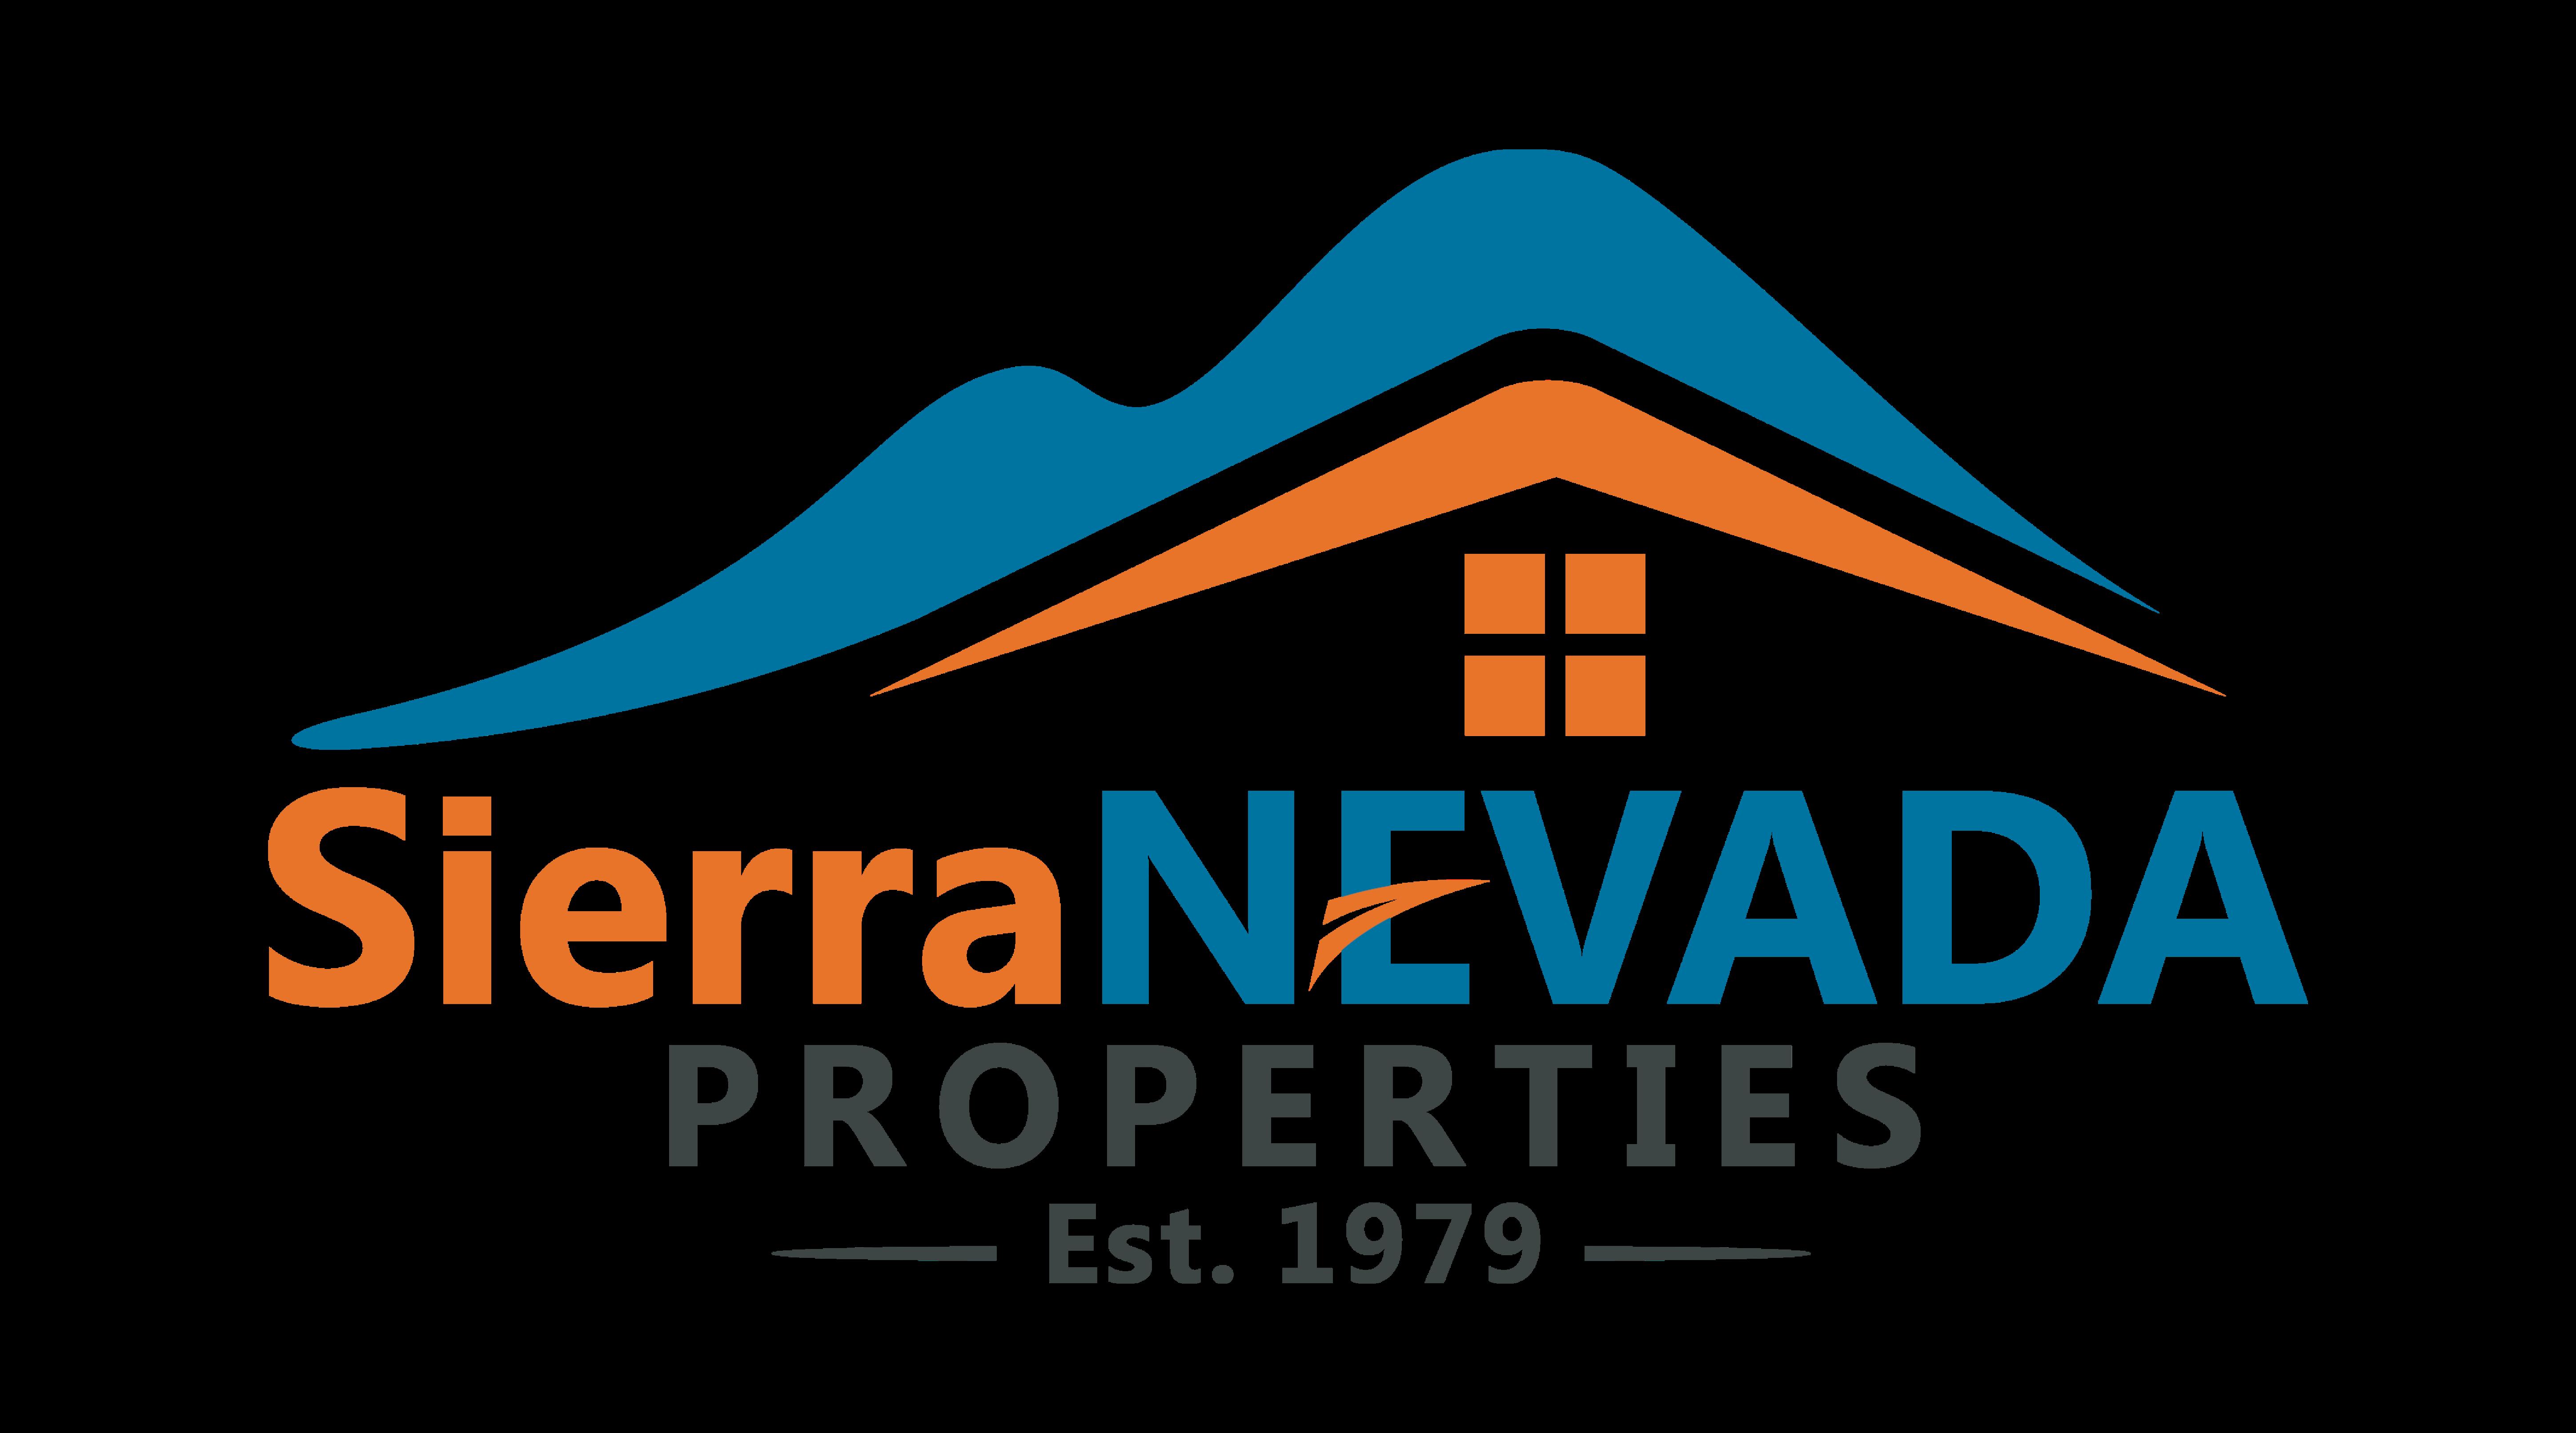 Santiago Solano - Sierra Nevada Properties Logo